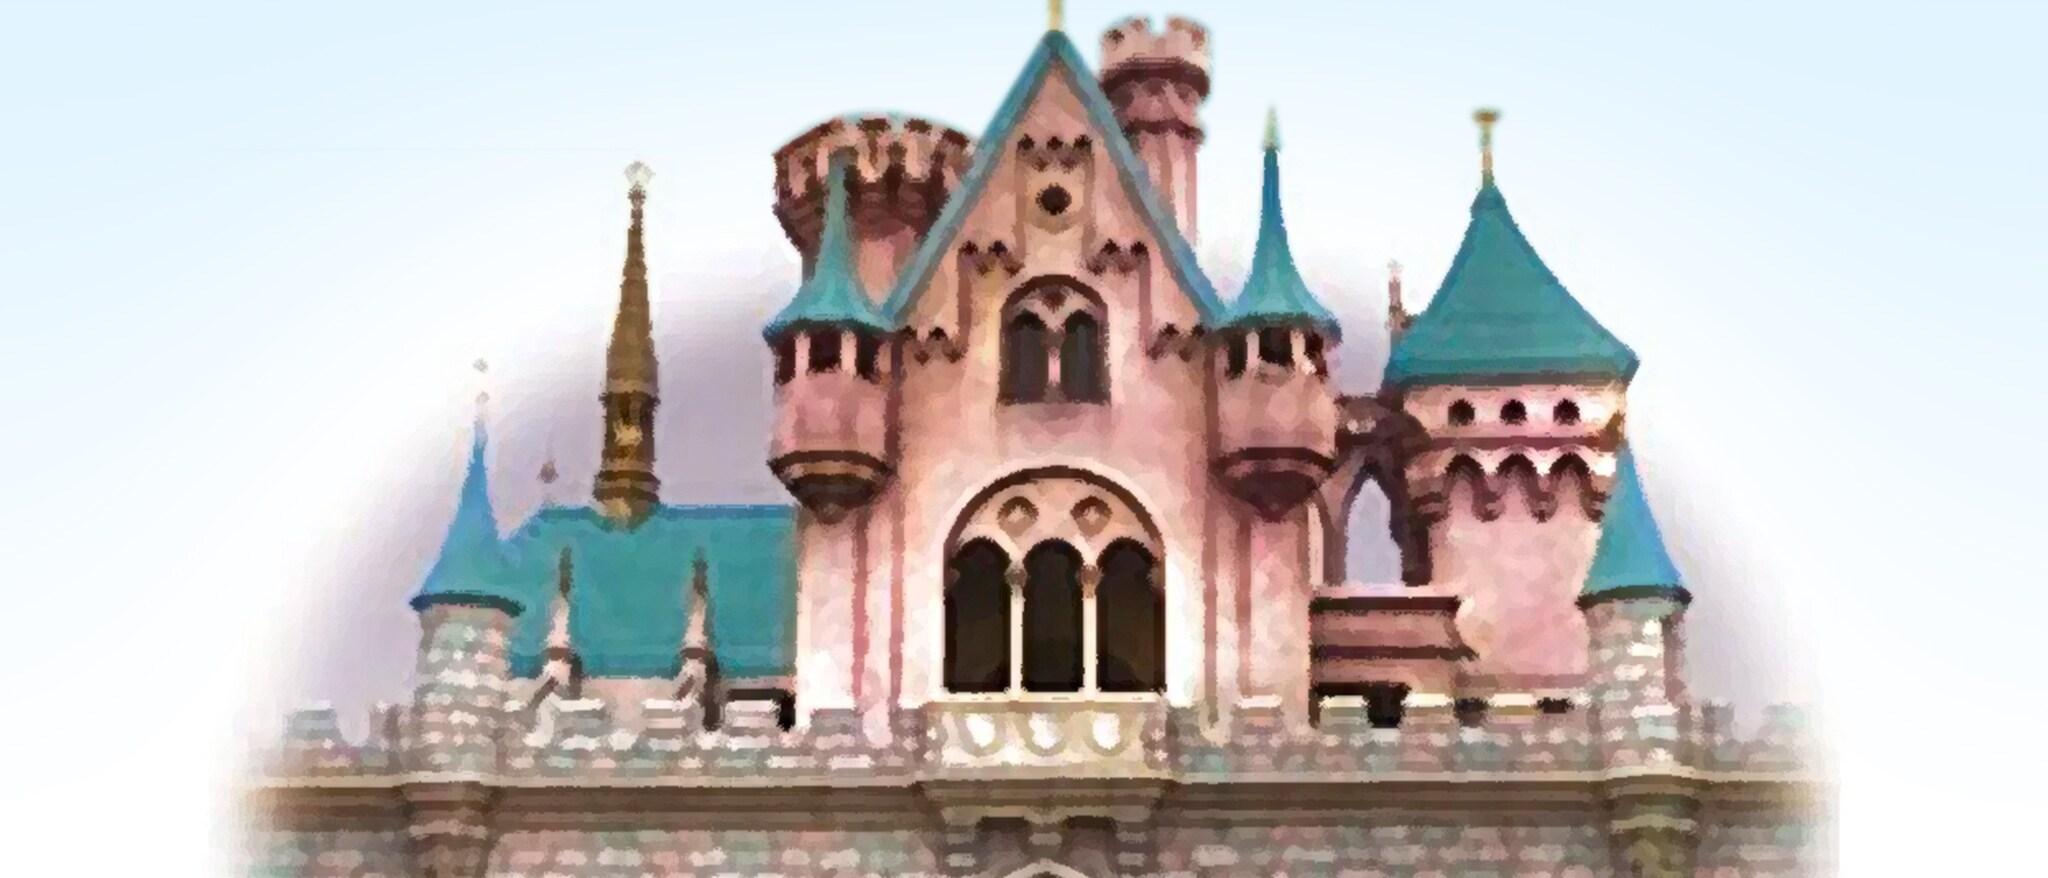 Disneyland, U.S.A. Hero